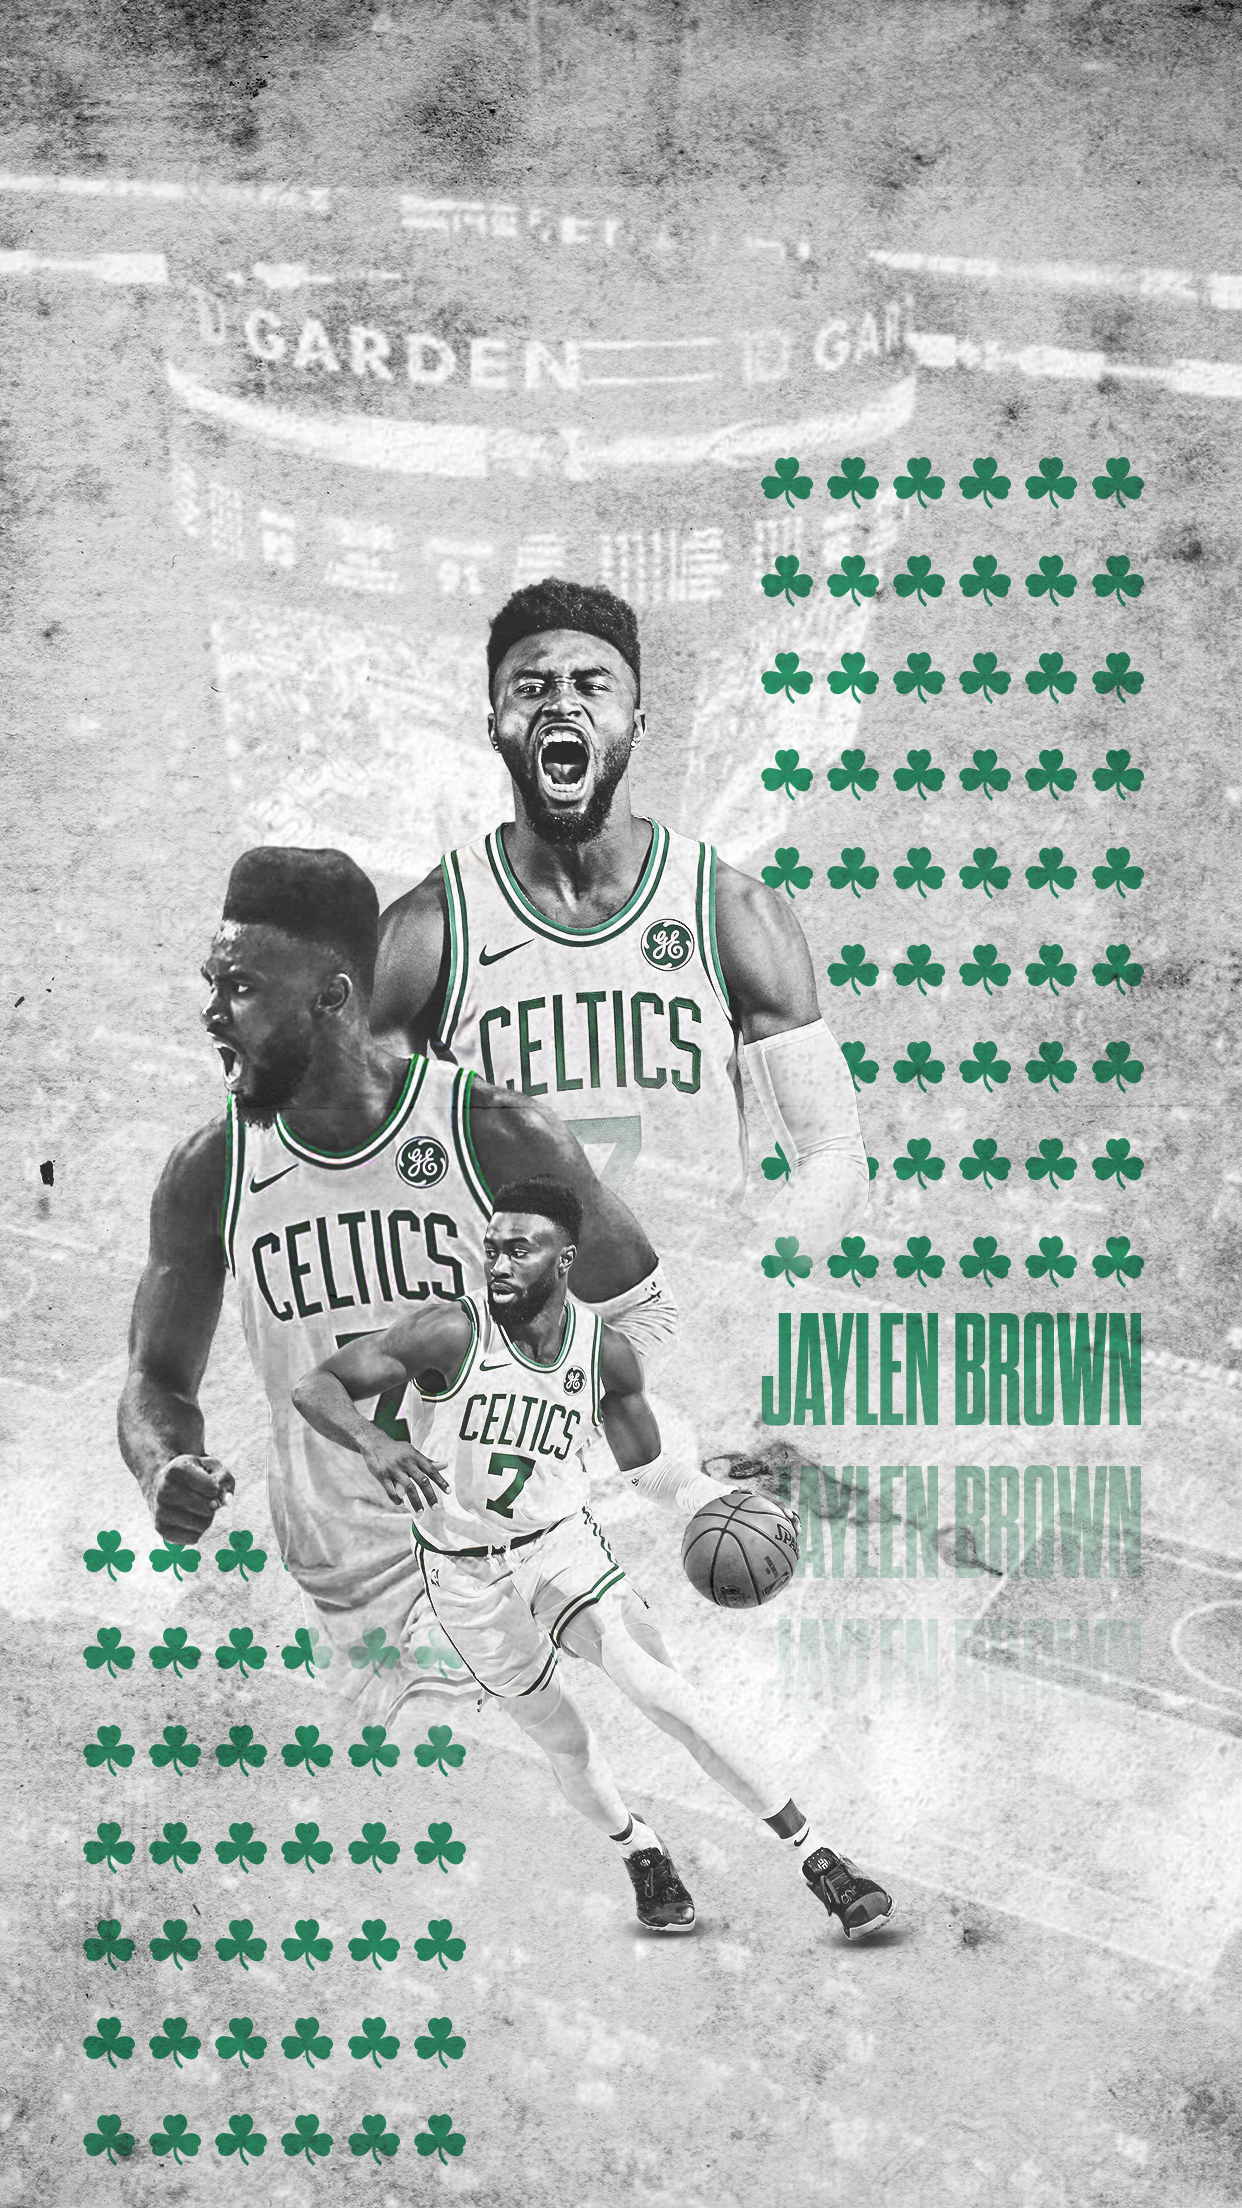 Celtics Wallpaper 2020 Iphone 1242x2208 Wallpaper Teahub Io